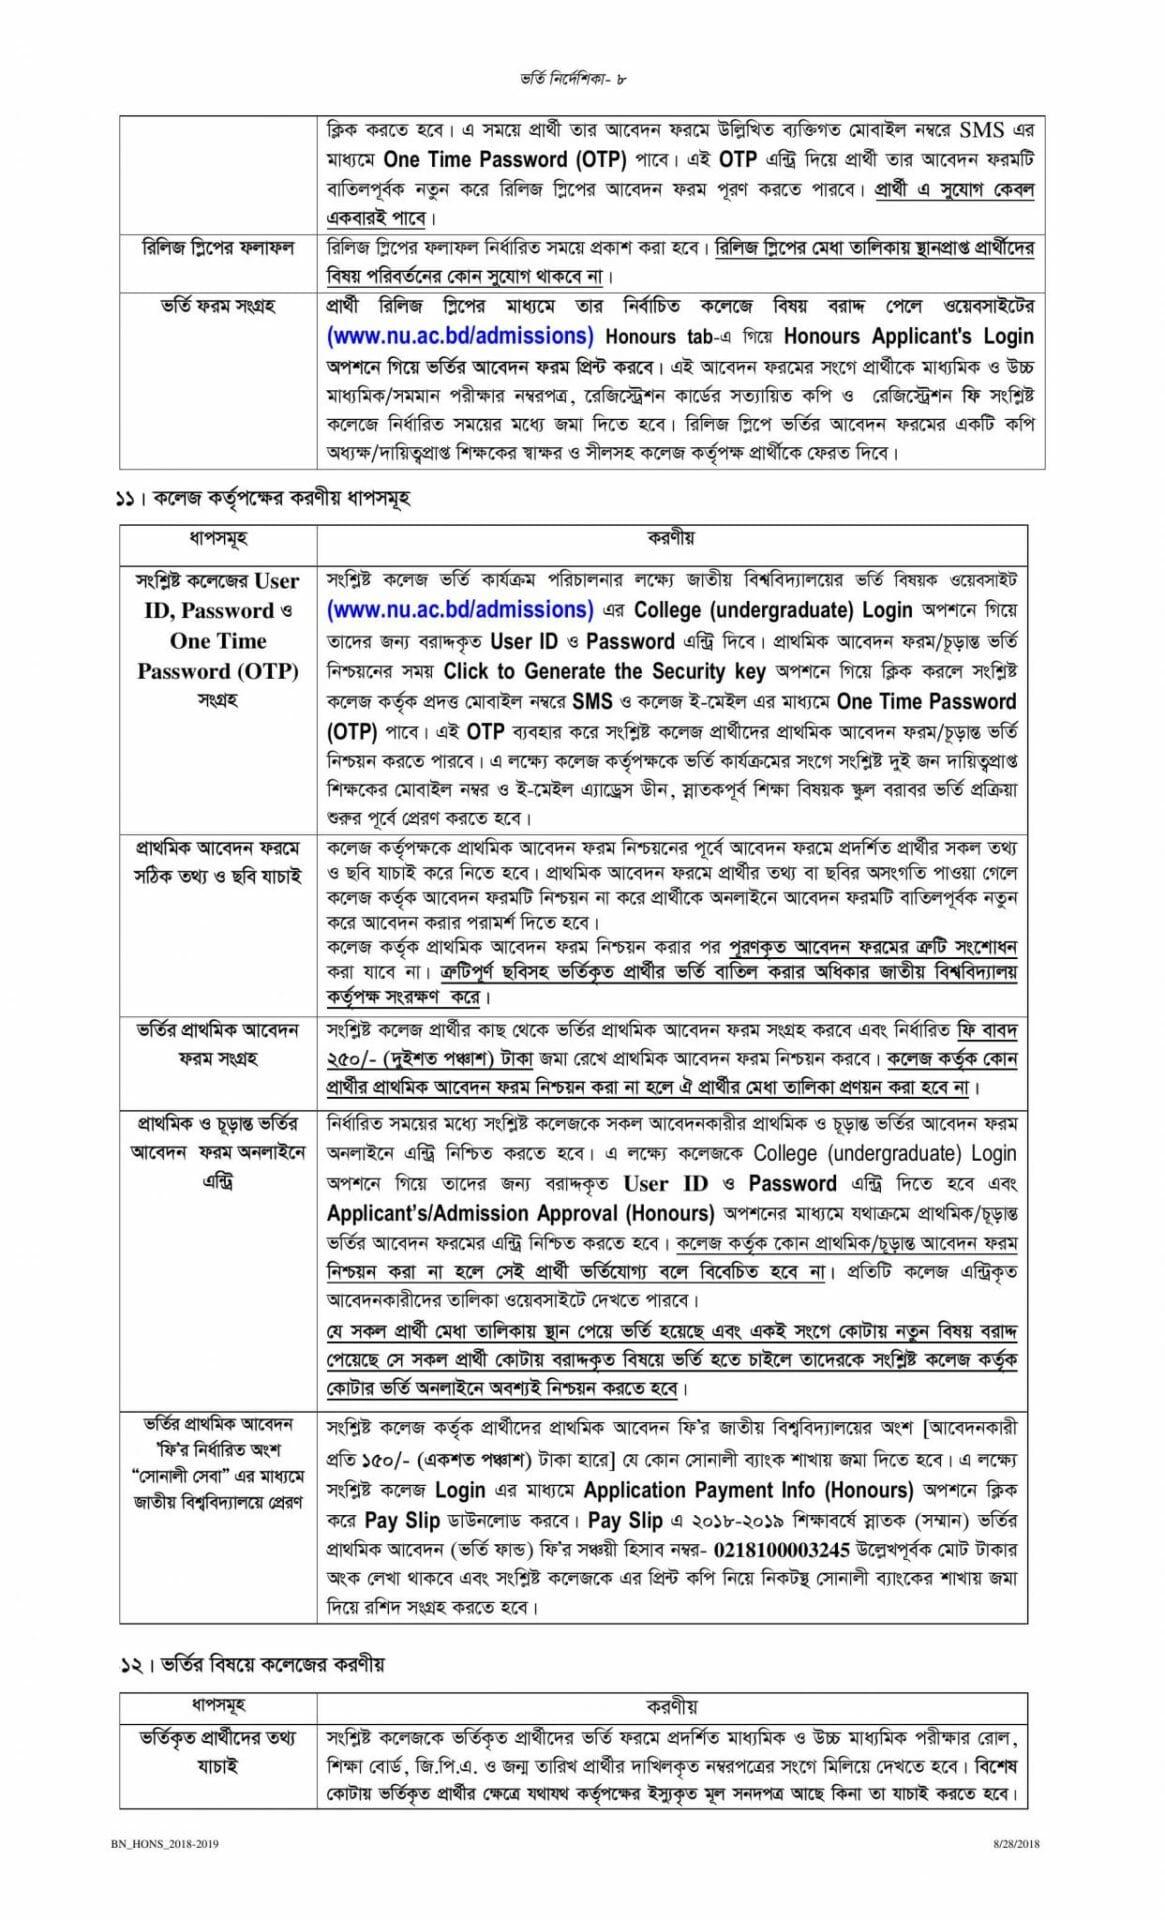 National University Admission Honours Guideline-8